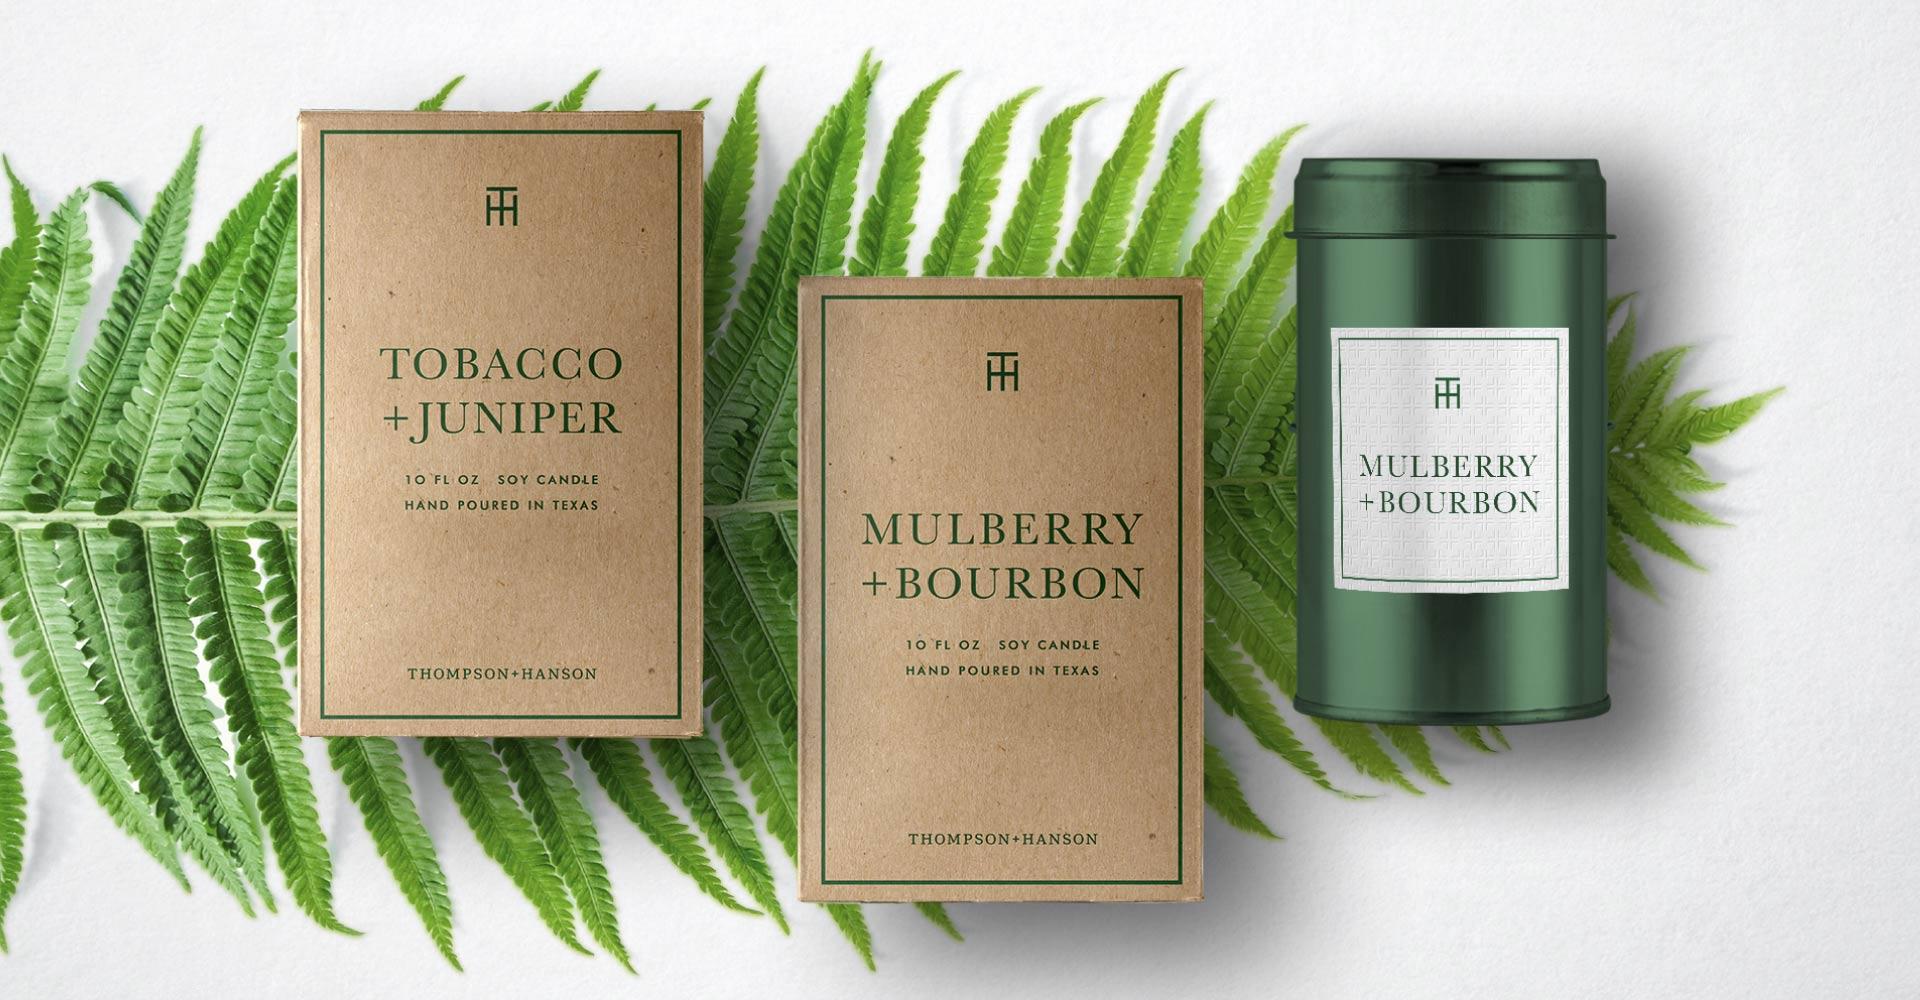 Creative_Retail_Packaging_Thompson_Hanson_Branding_14.jpg